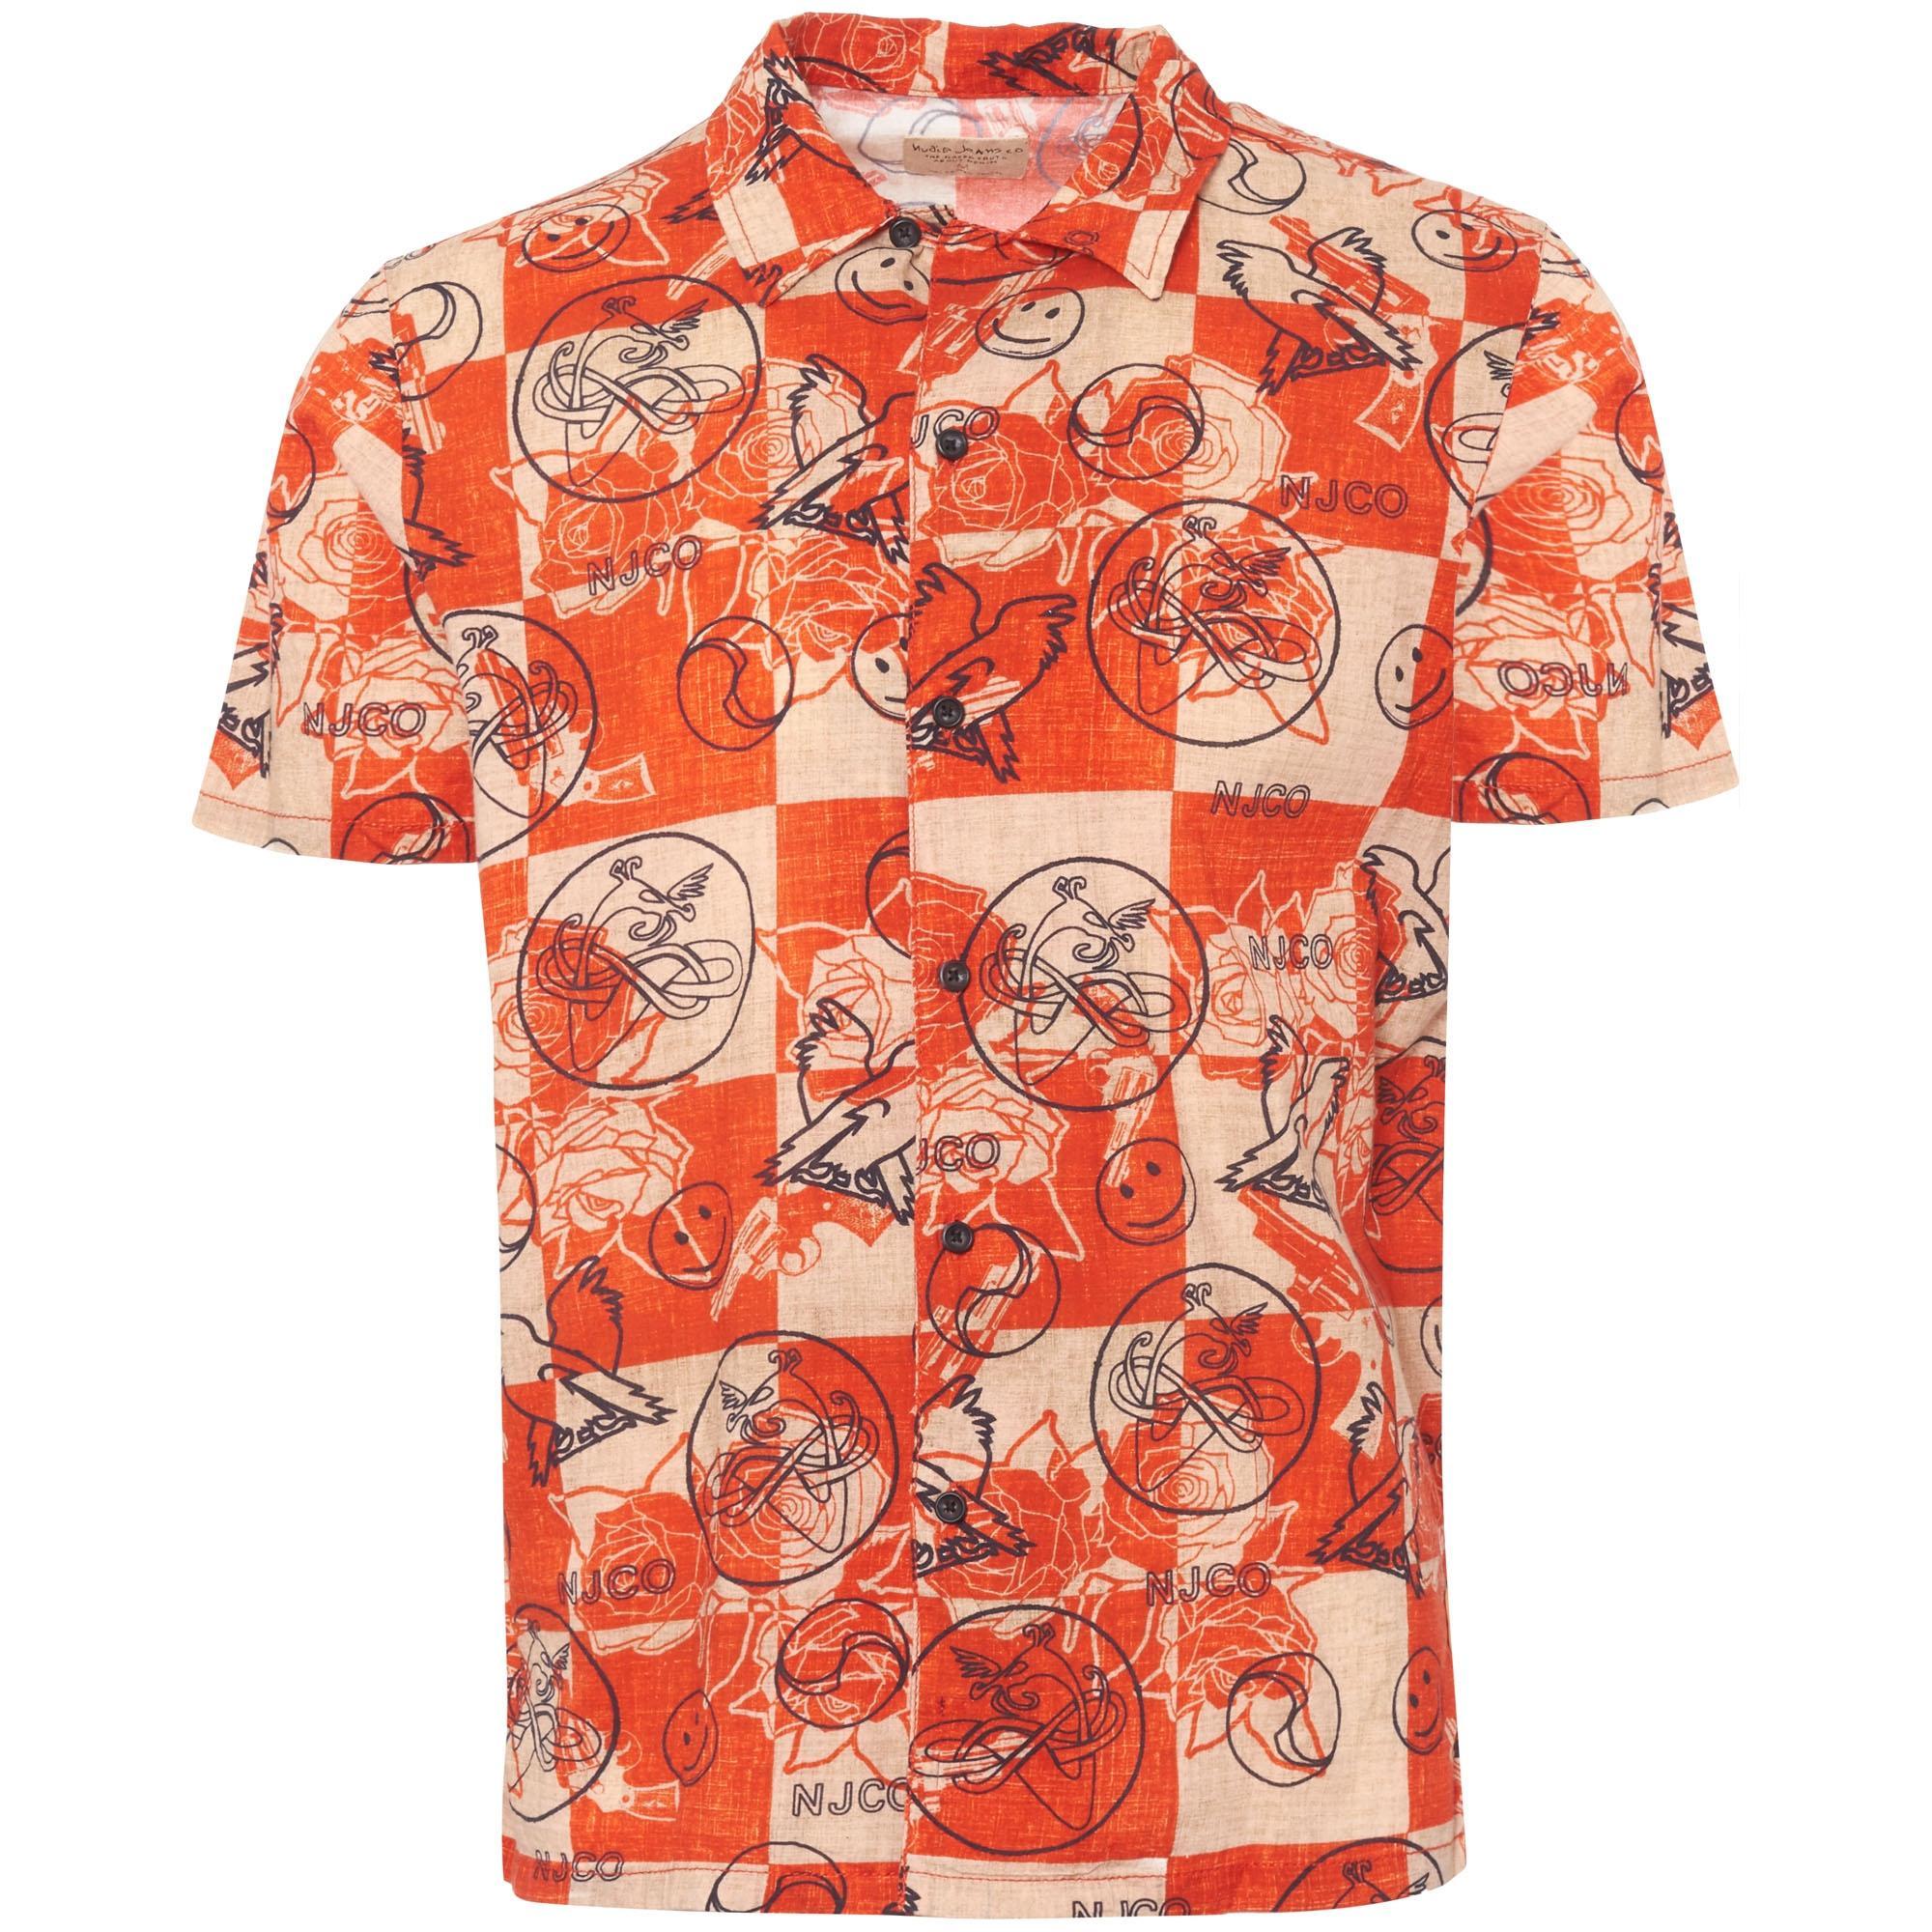 Nudie Jeans Cotton Brandon Roses Short Sleeve Regular Fit Shirt in Red for Men